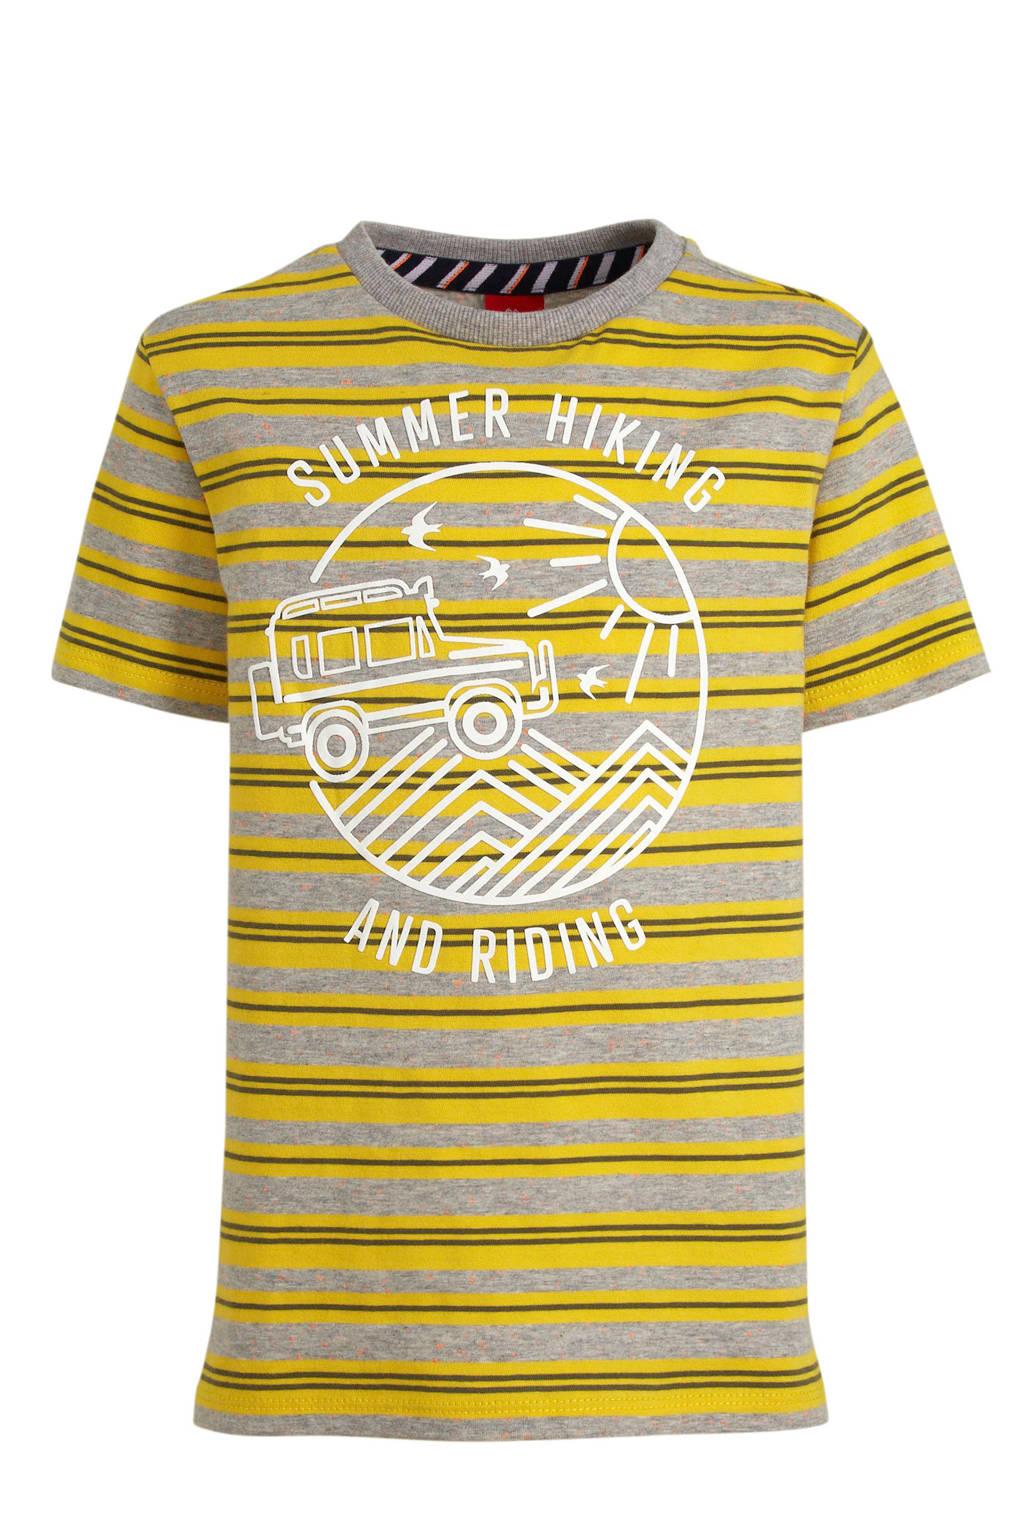 s.Oliver gestreept regular fit T-shirt grijs melange/geel, Grijs melange/geel